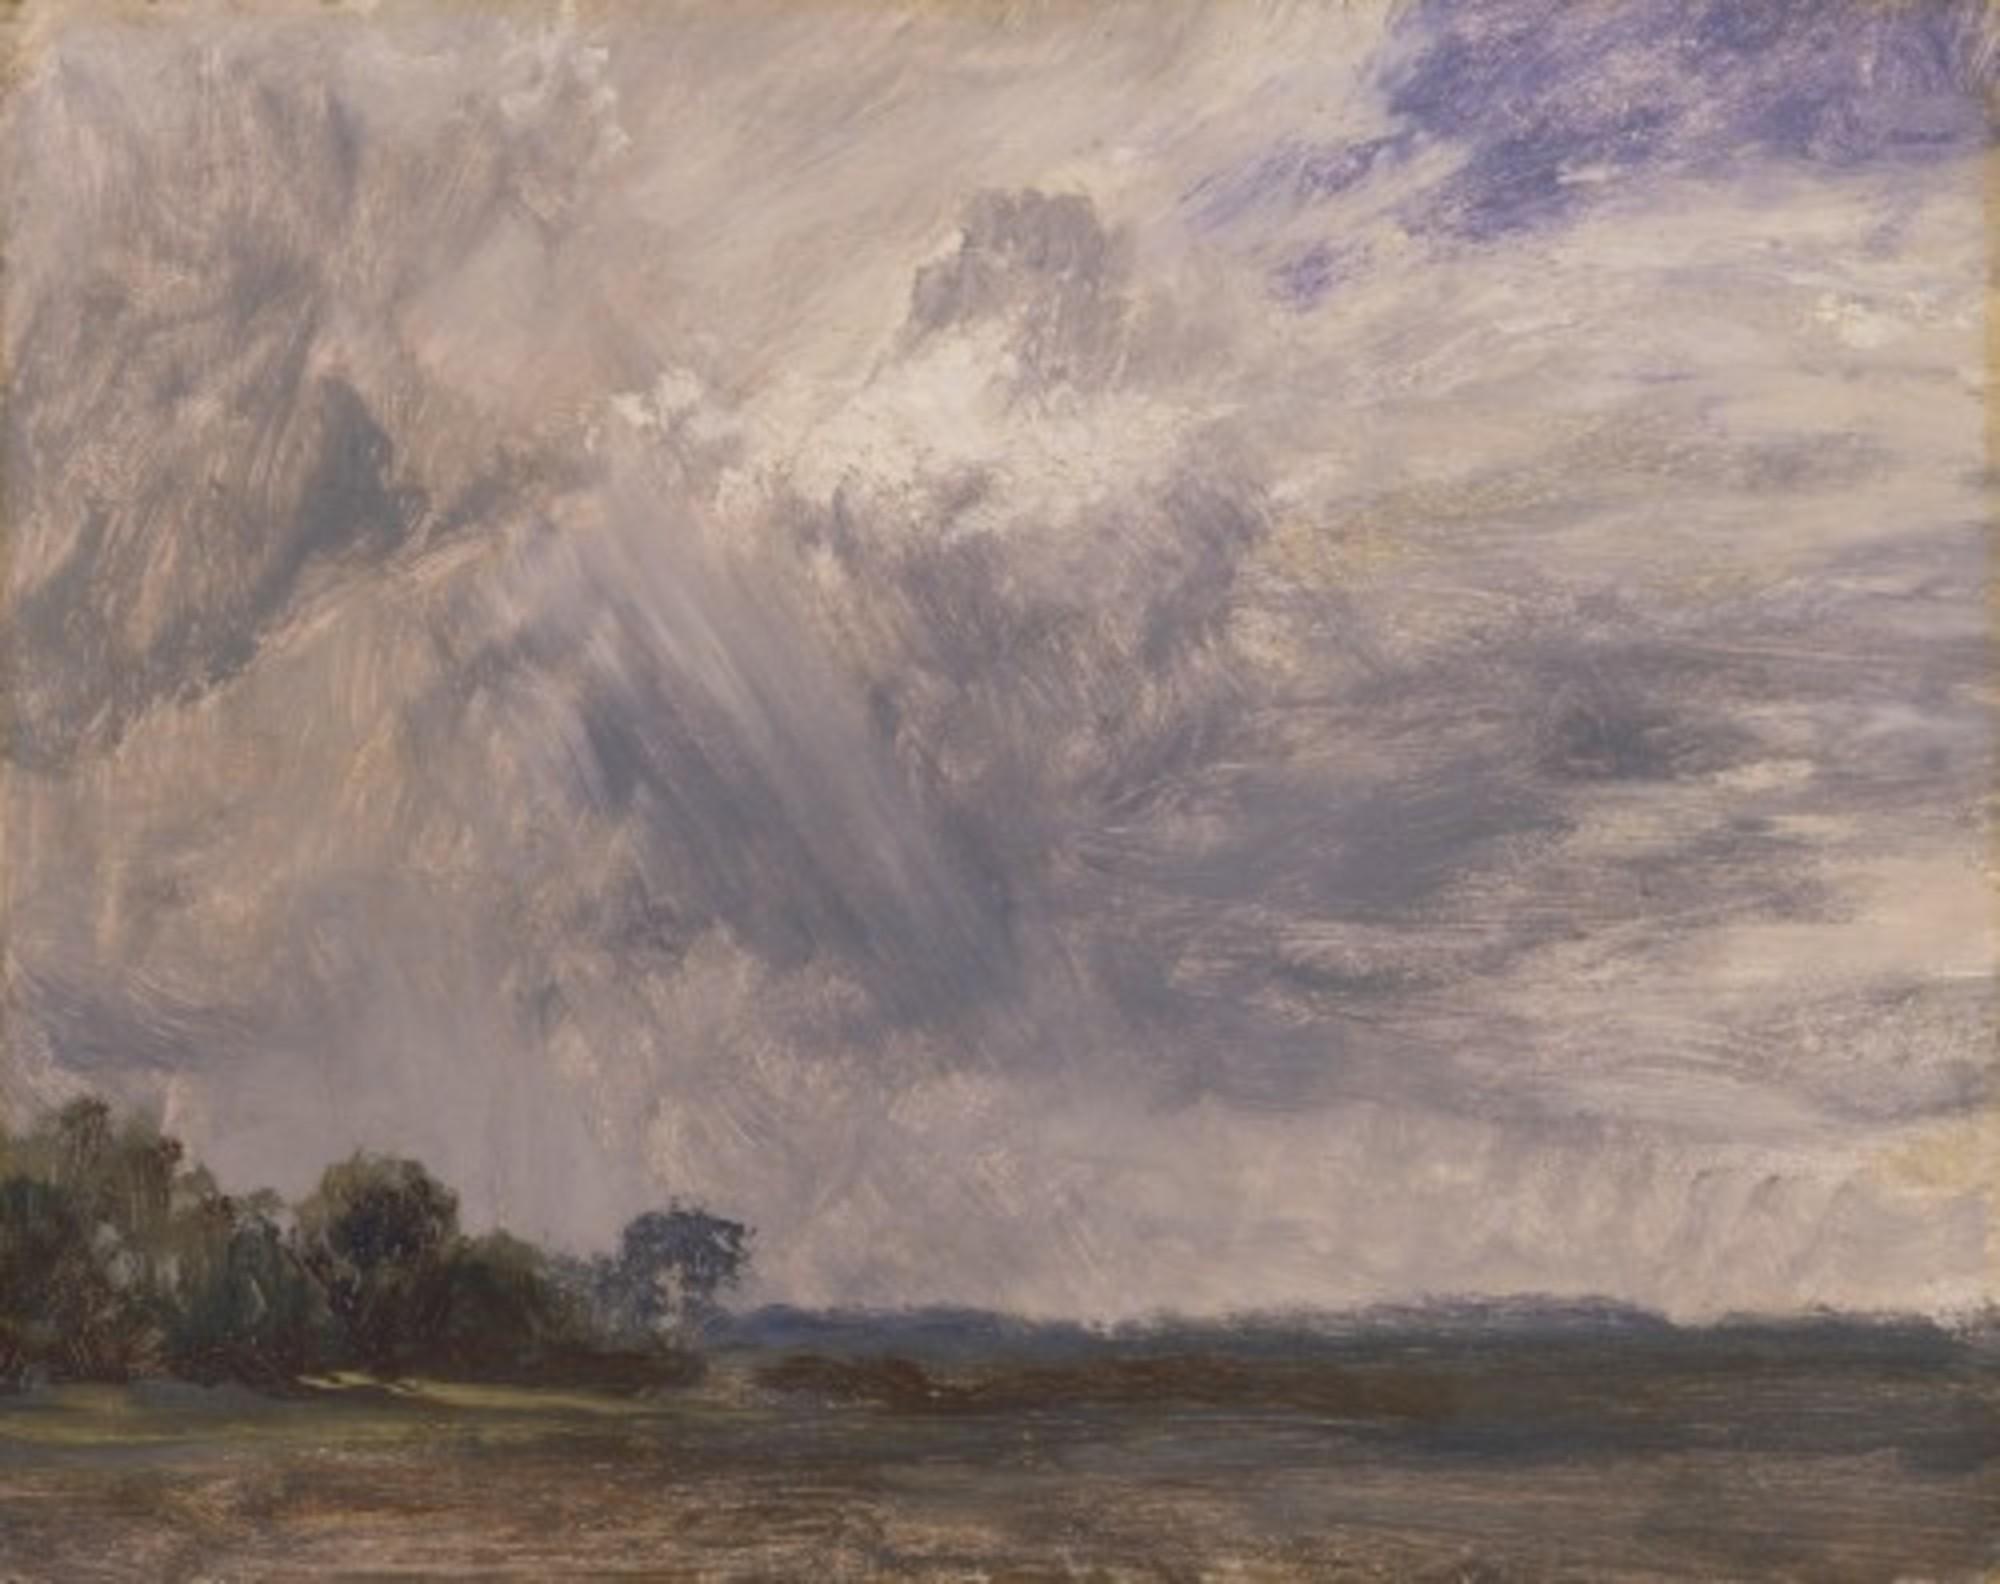 John-Constable---Study-of-a-Cloudy-Sky---Google-Art-Project.jpg